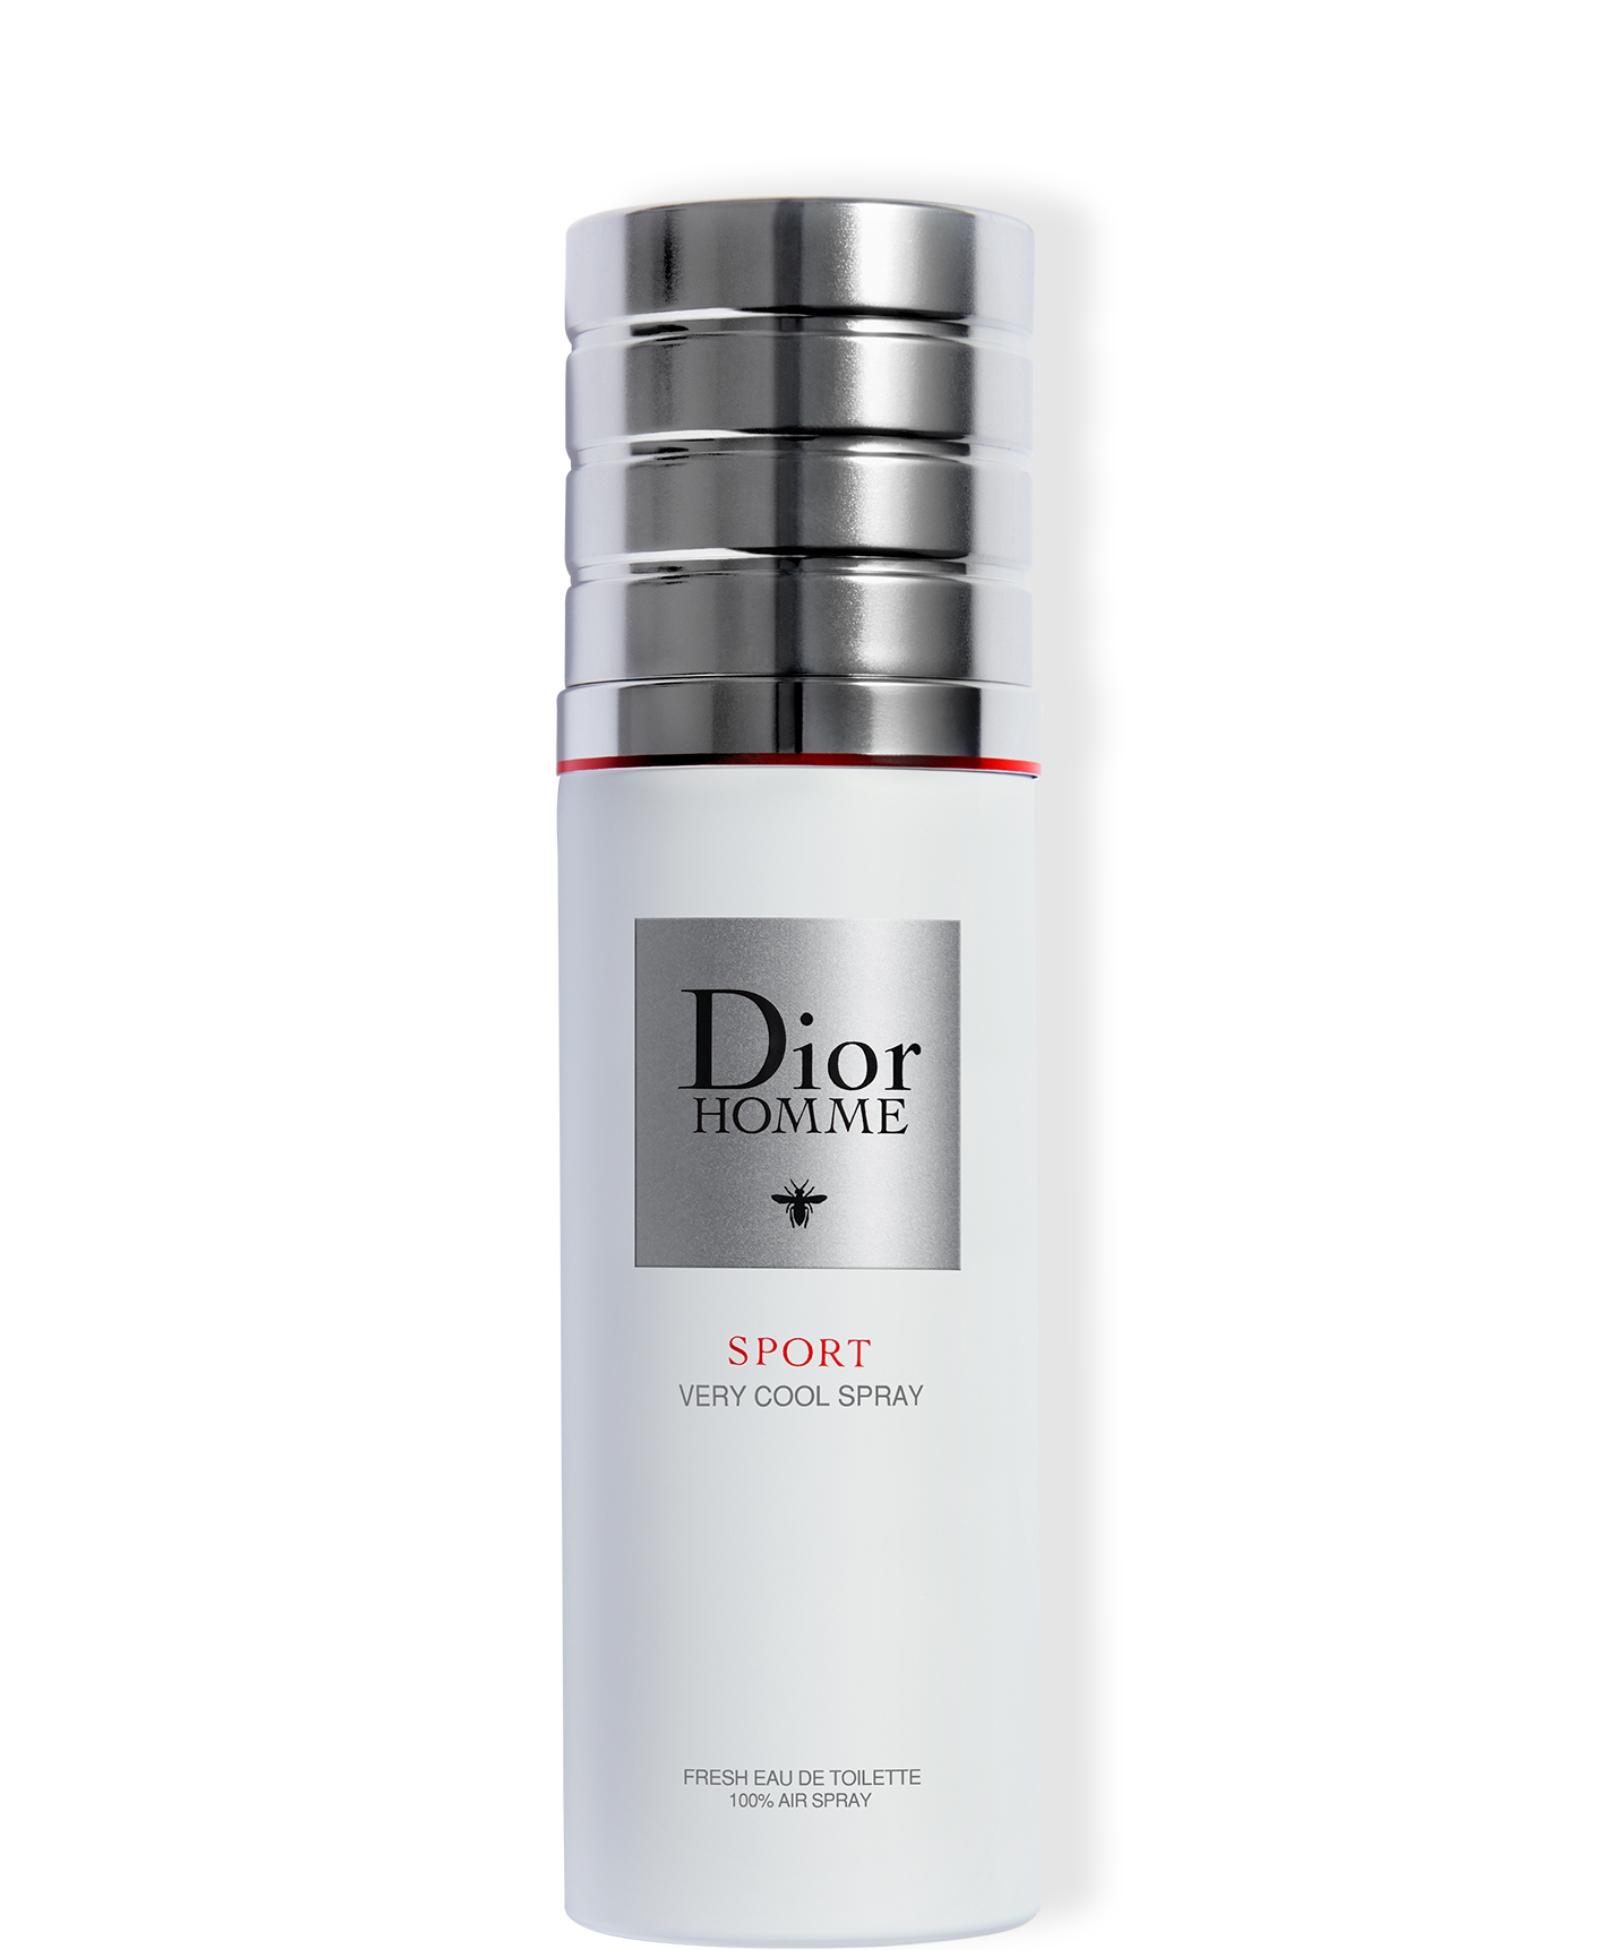 DIOR Dior Homme Sport Very Cool Spray Eau de Toilette, 100 ml